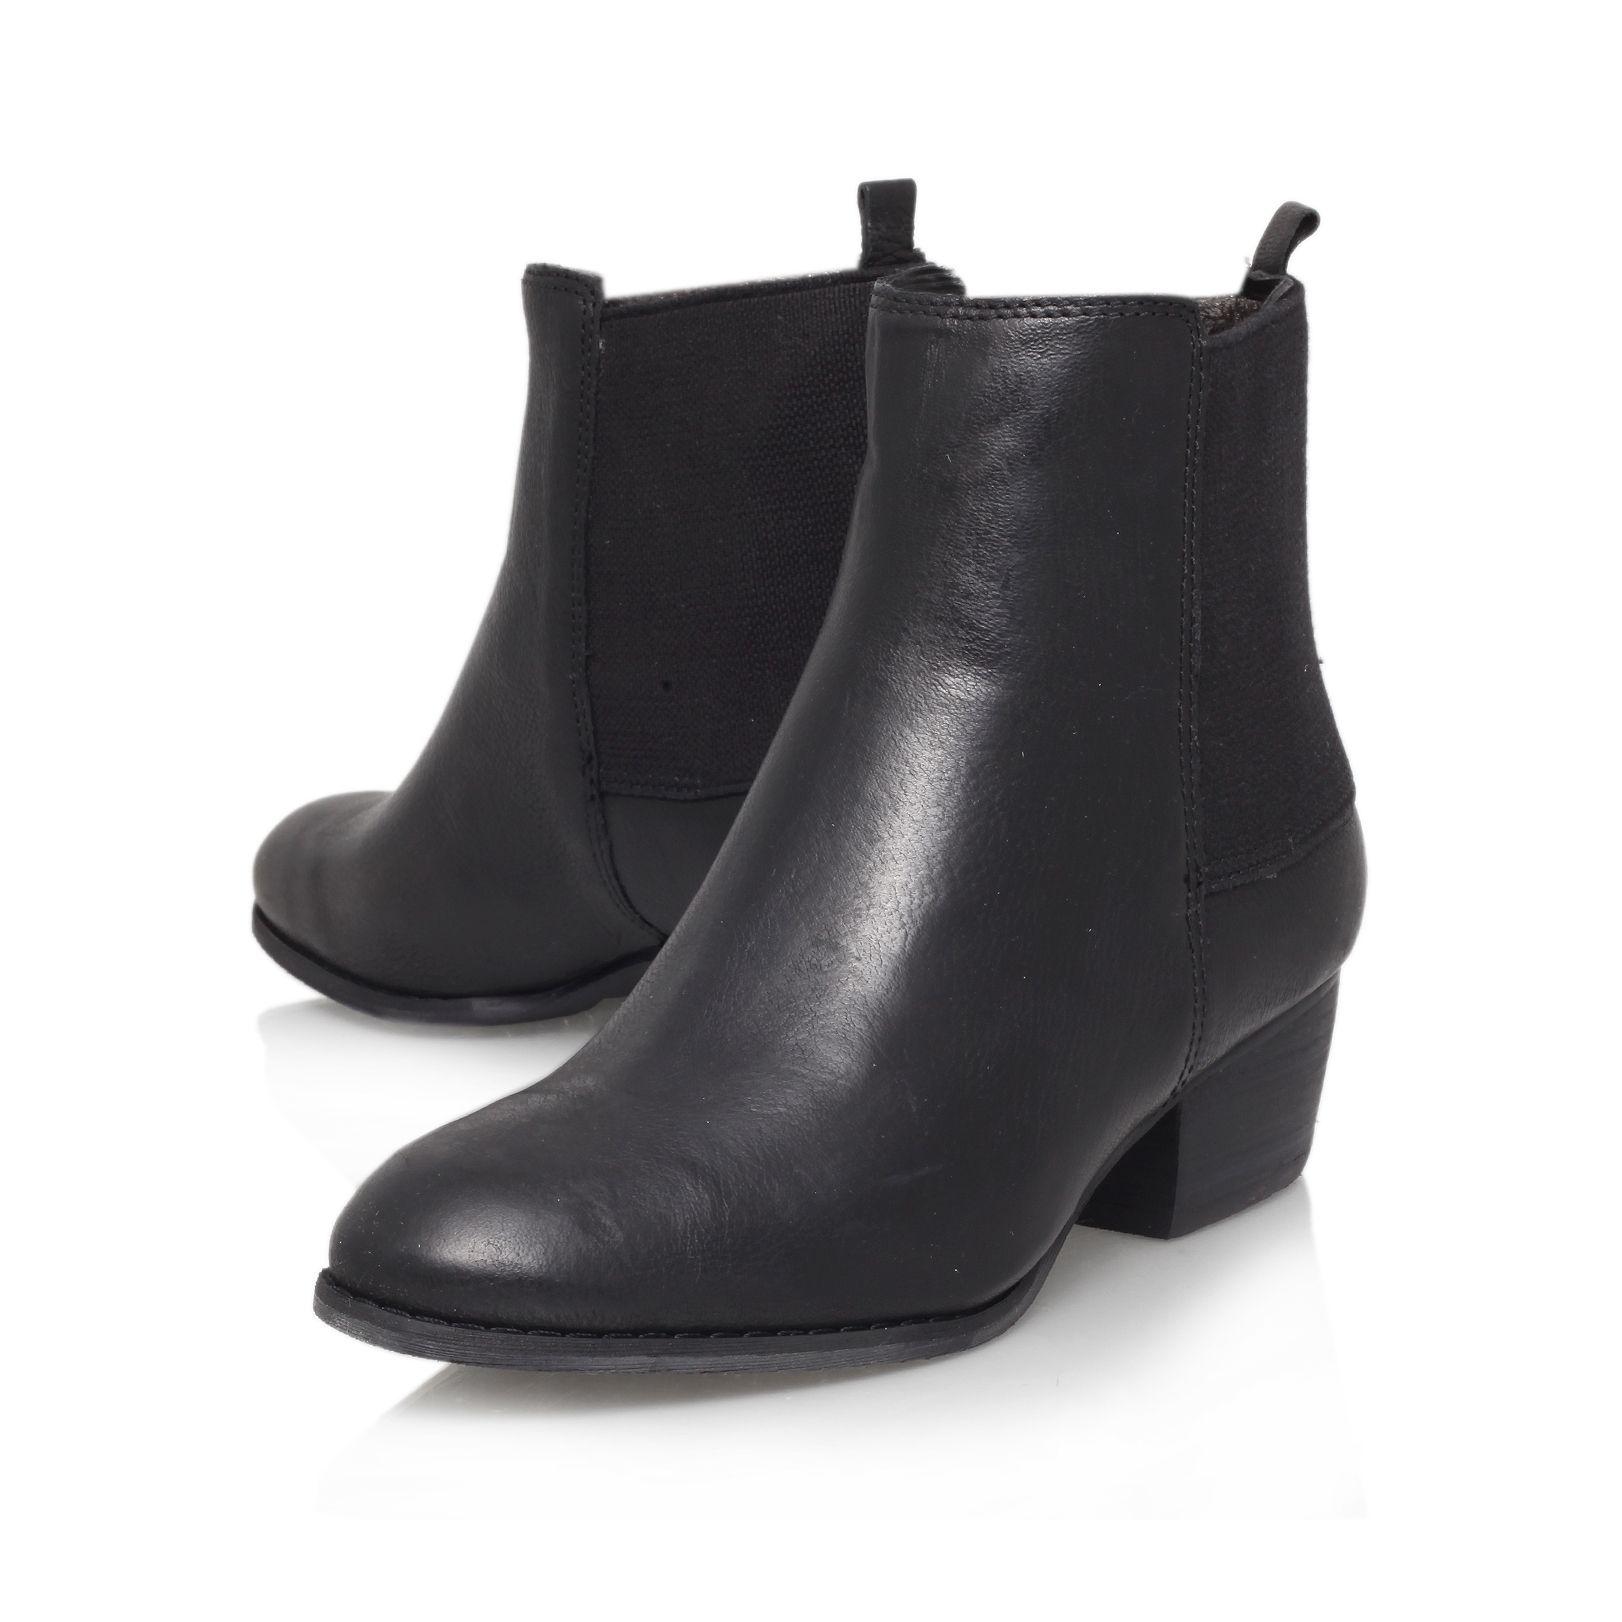 Nine west Jerryrig Low Block Heeled Ankle Boot in Black | Lyst